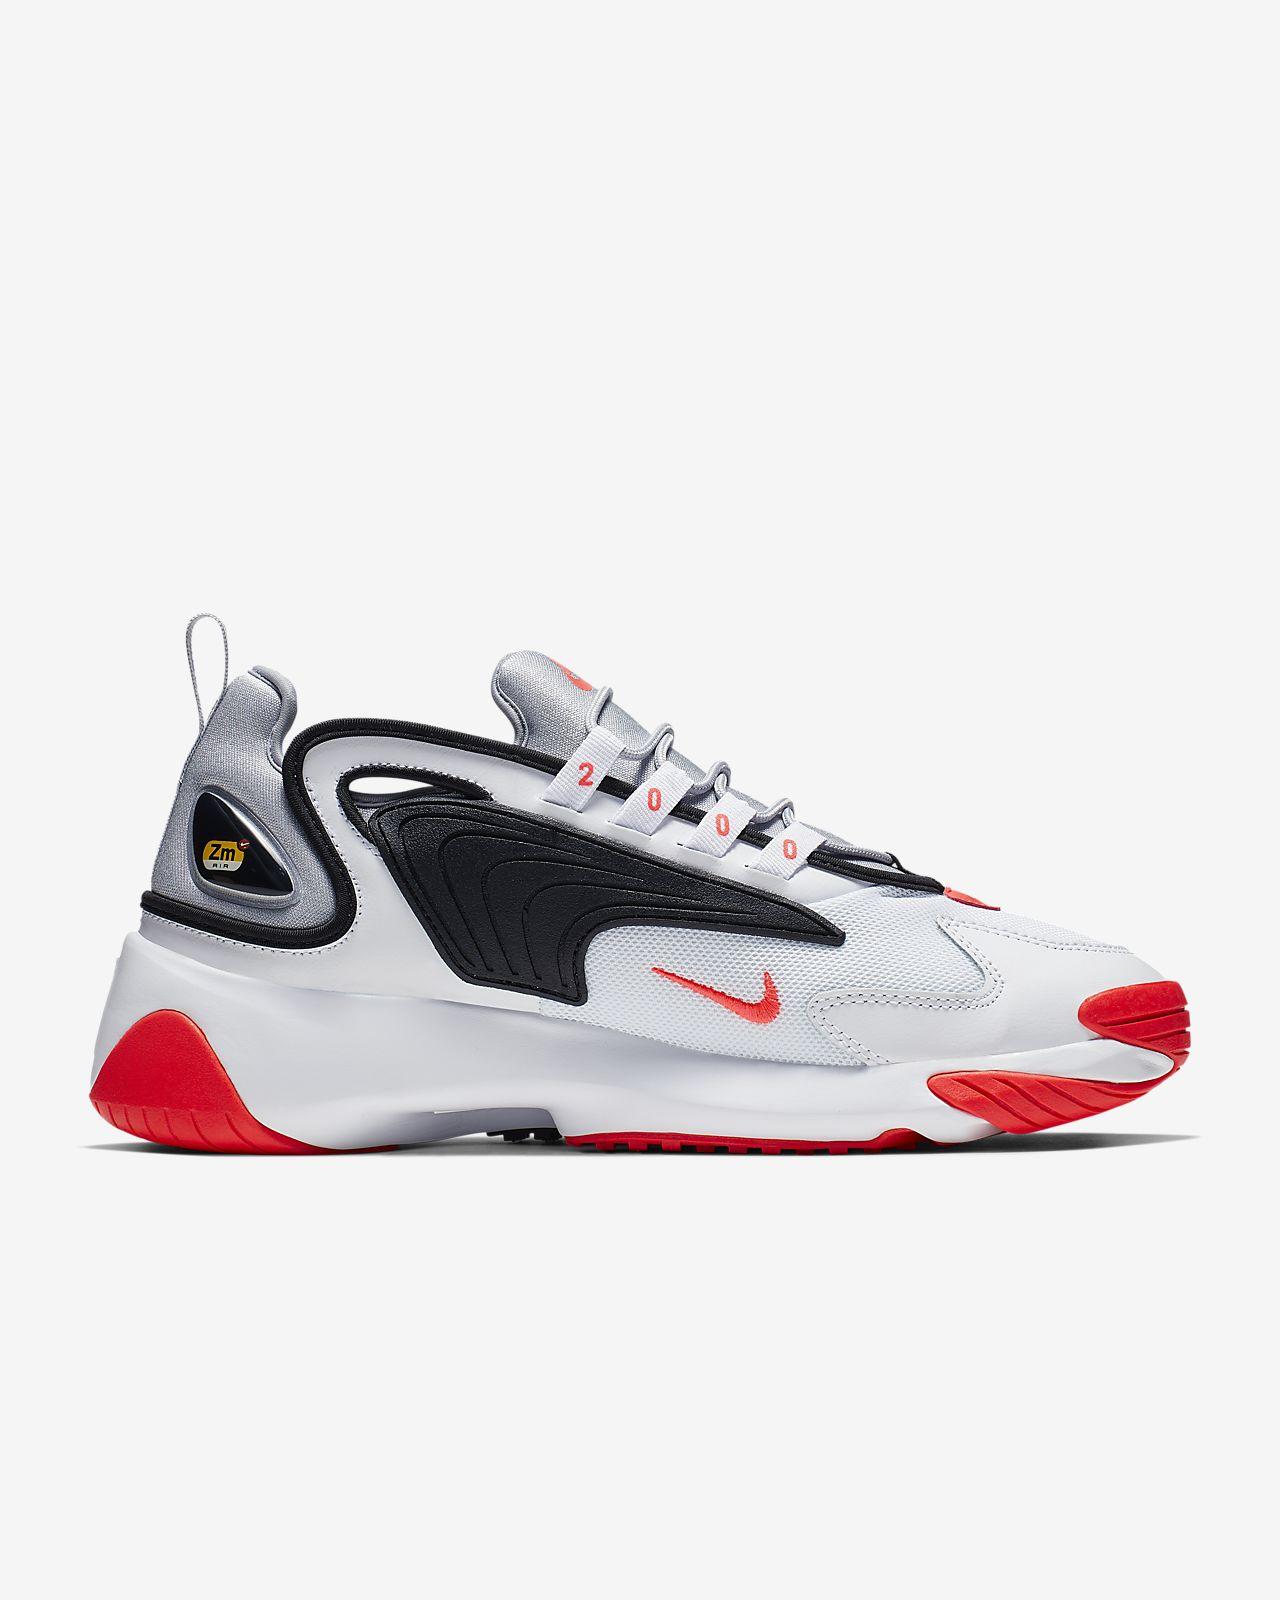 c633ede737cf Nike Zoom 2K Men s Shoe. Nike.com LU